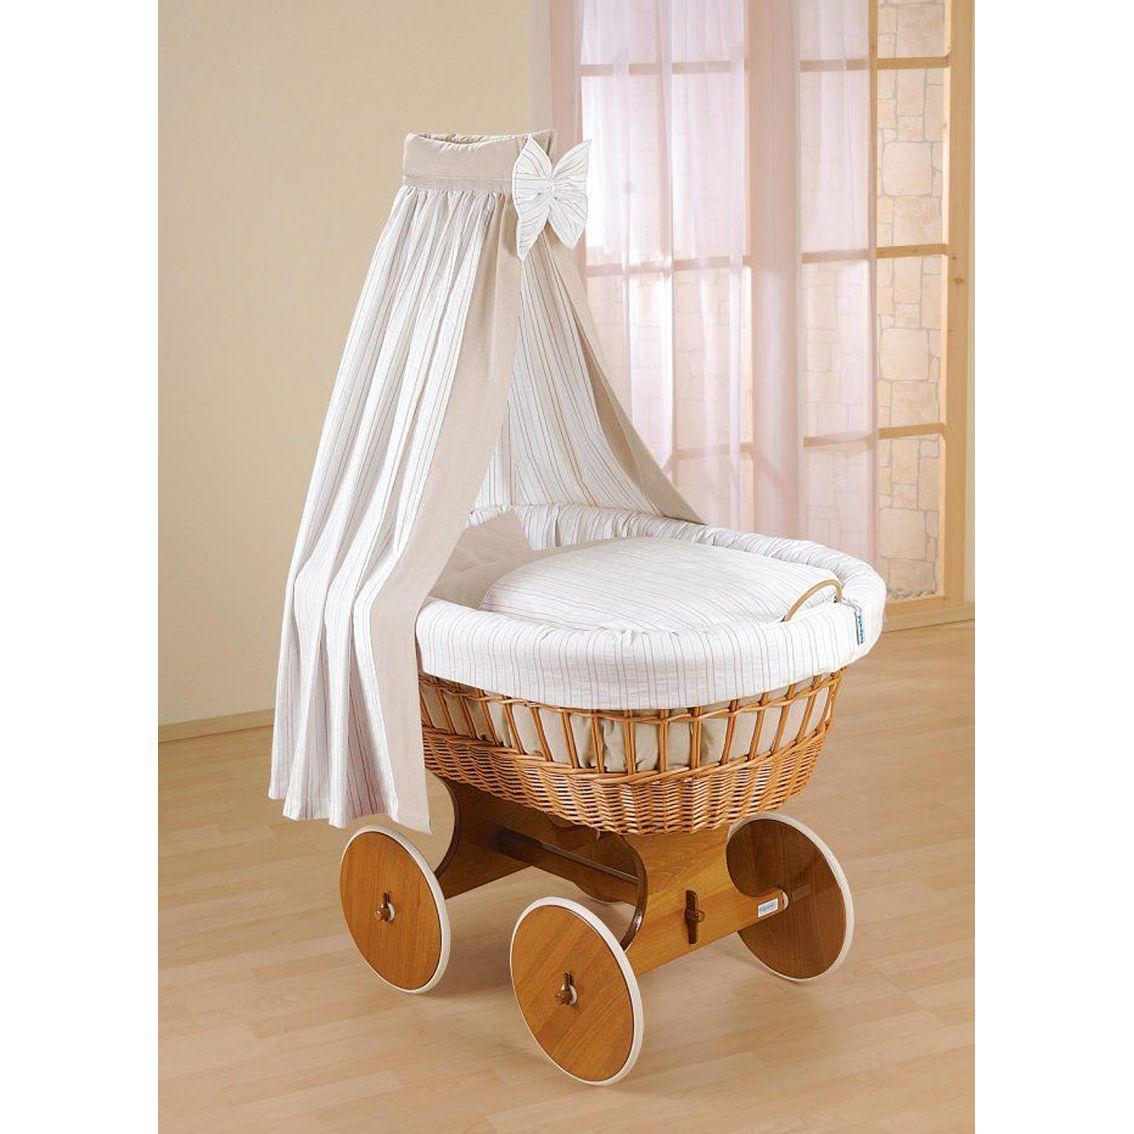 leipold cappuccino bollerwagen drape crib. Black Bedroom Furniture Sets. Home Design Ideas